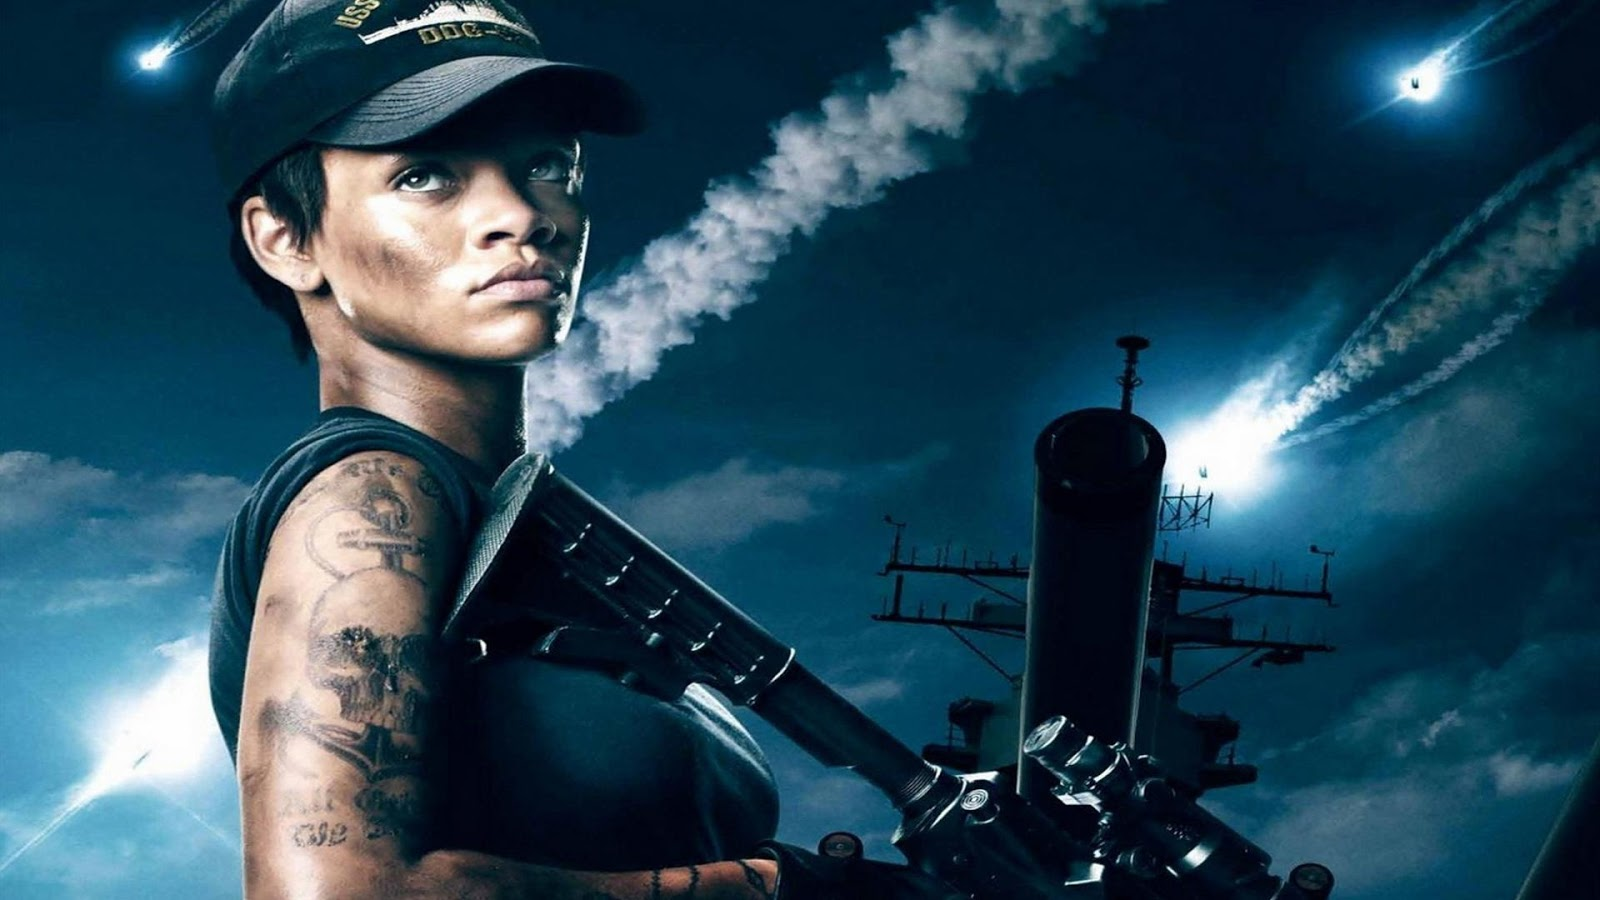 battleship 2012 movie hd - photo #34